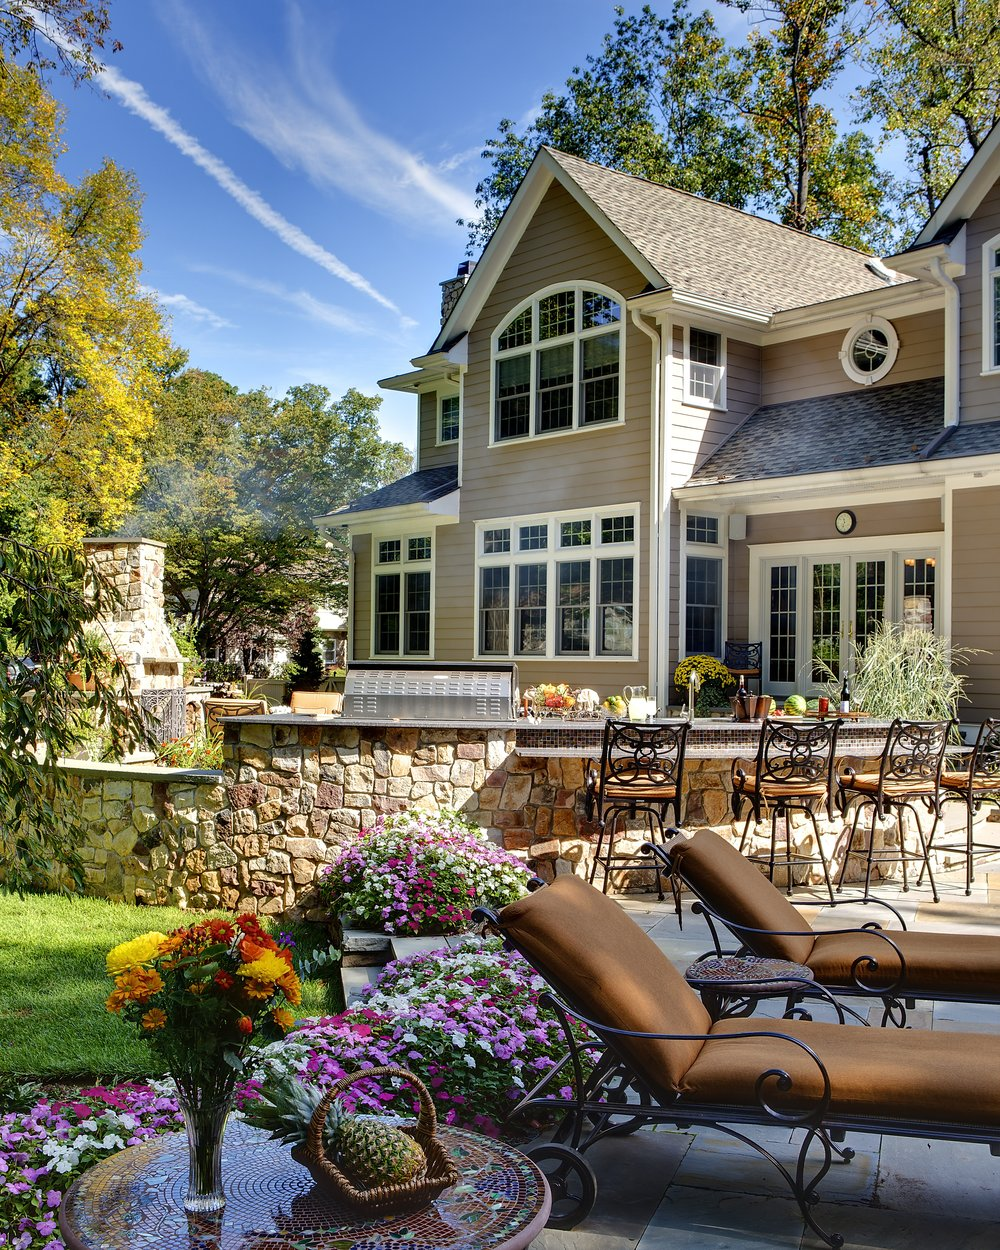 Landscape Design , Patio Design, Outdoor Kitchens, Bergen County, NJ